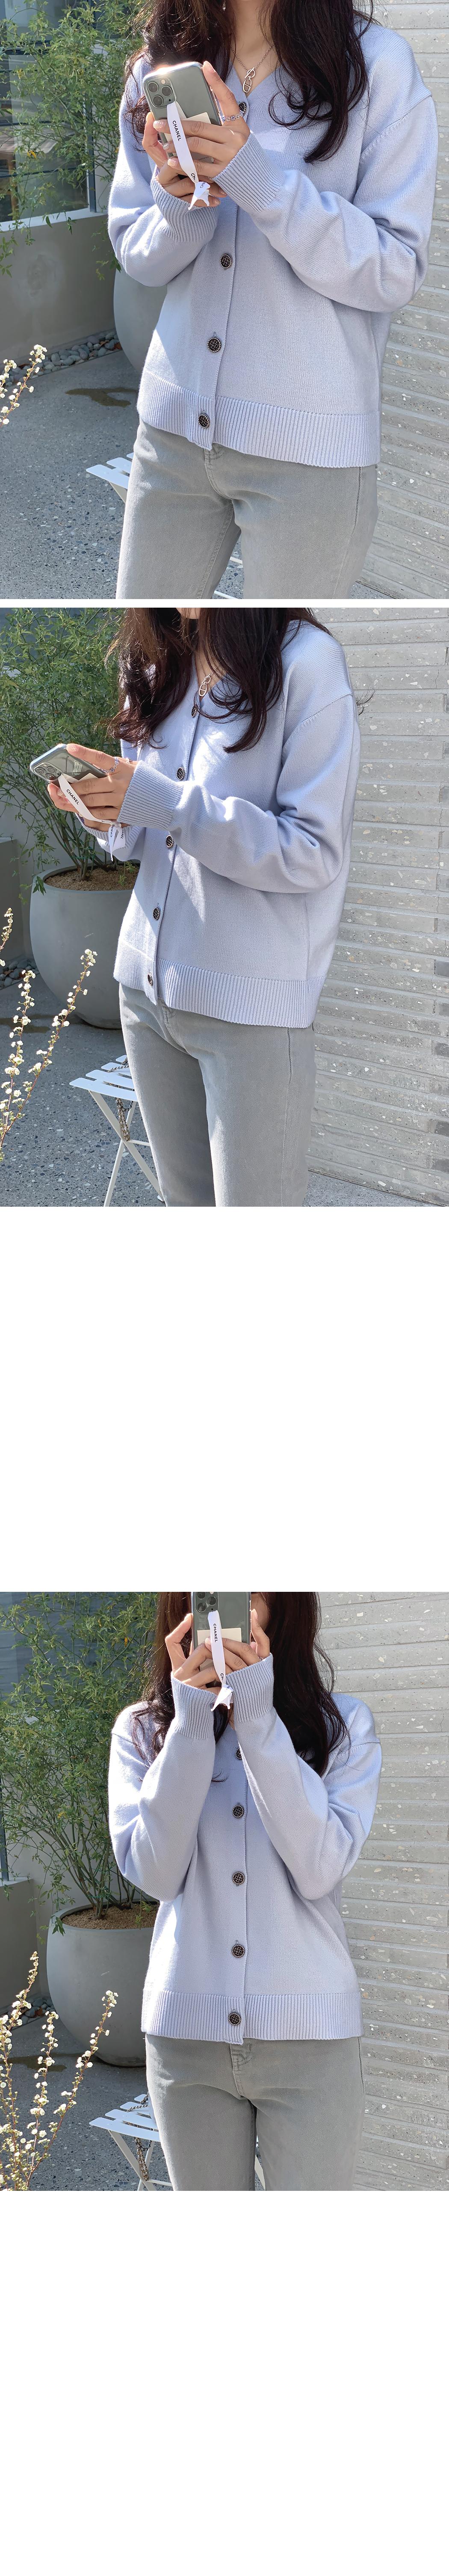 My-littleclassic / Printemps-button cardigan